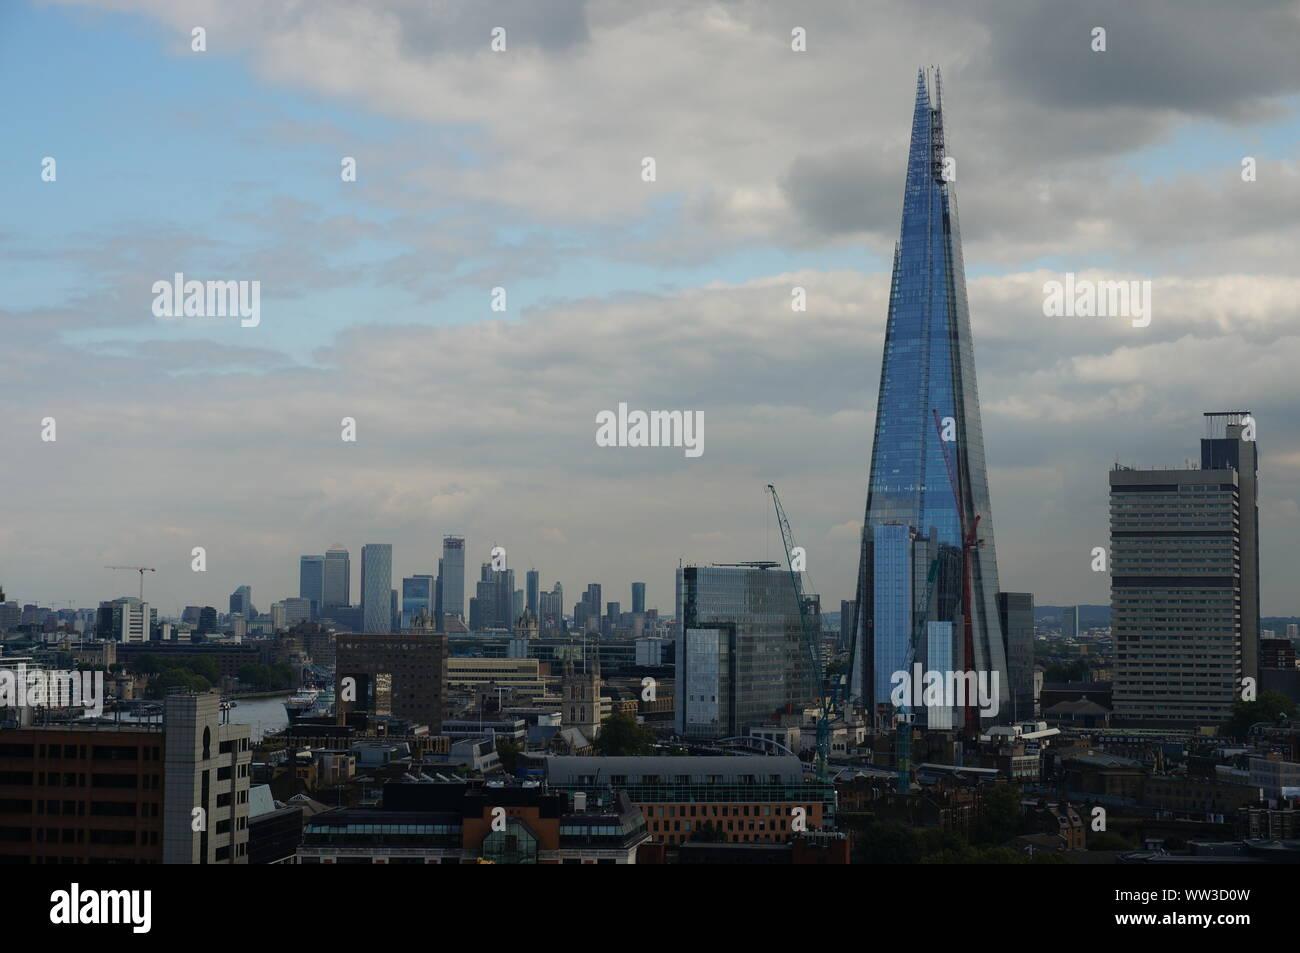 City of London Stock Photo